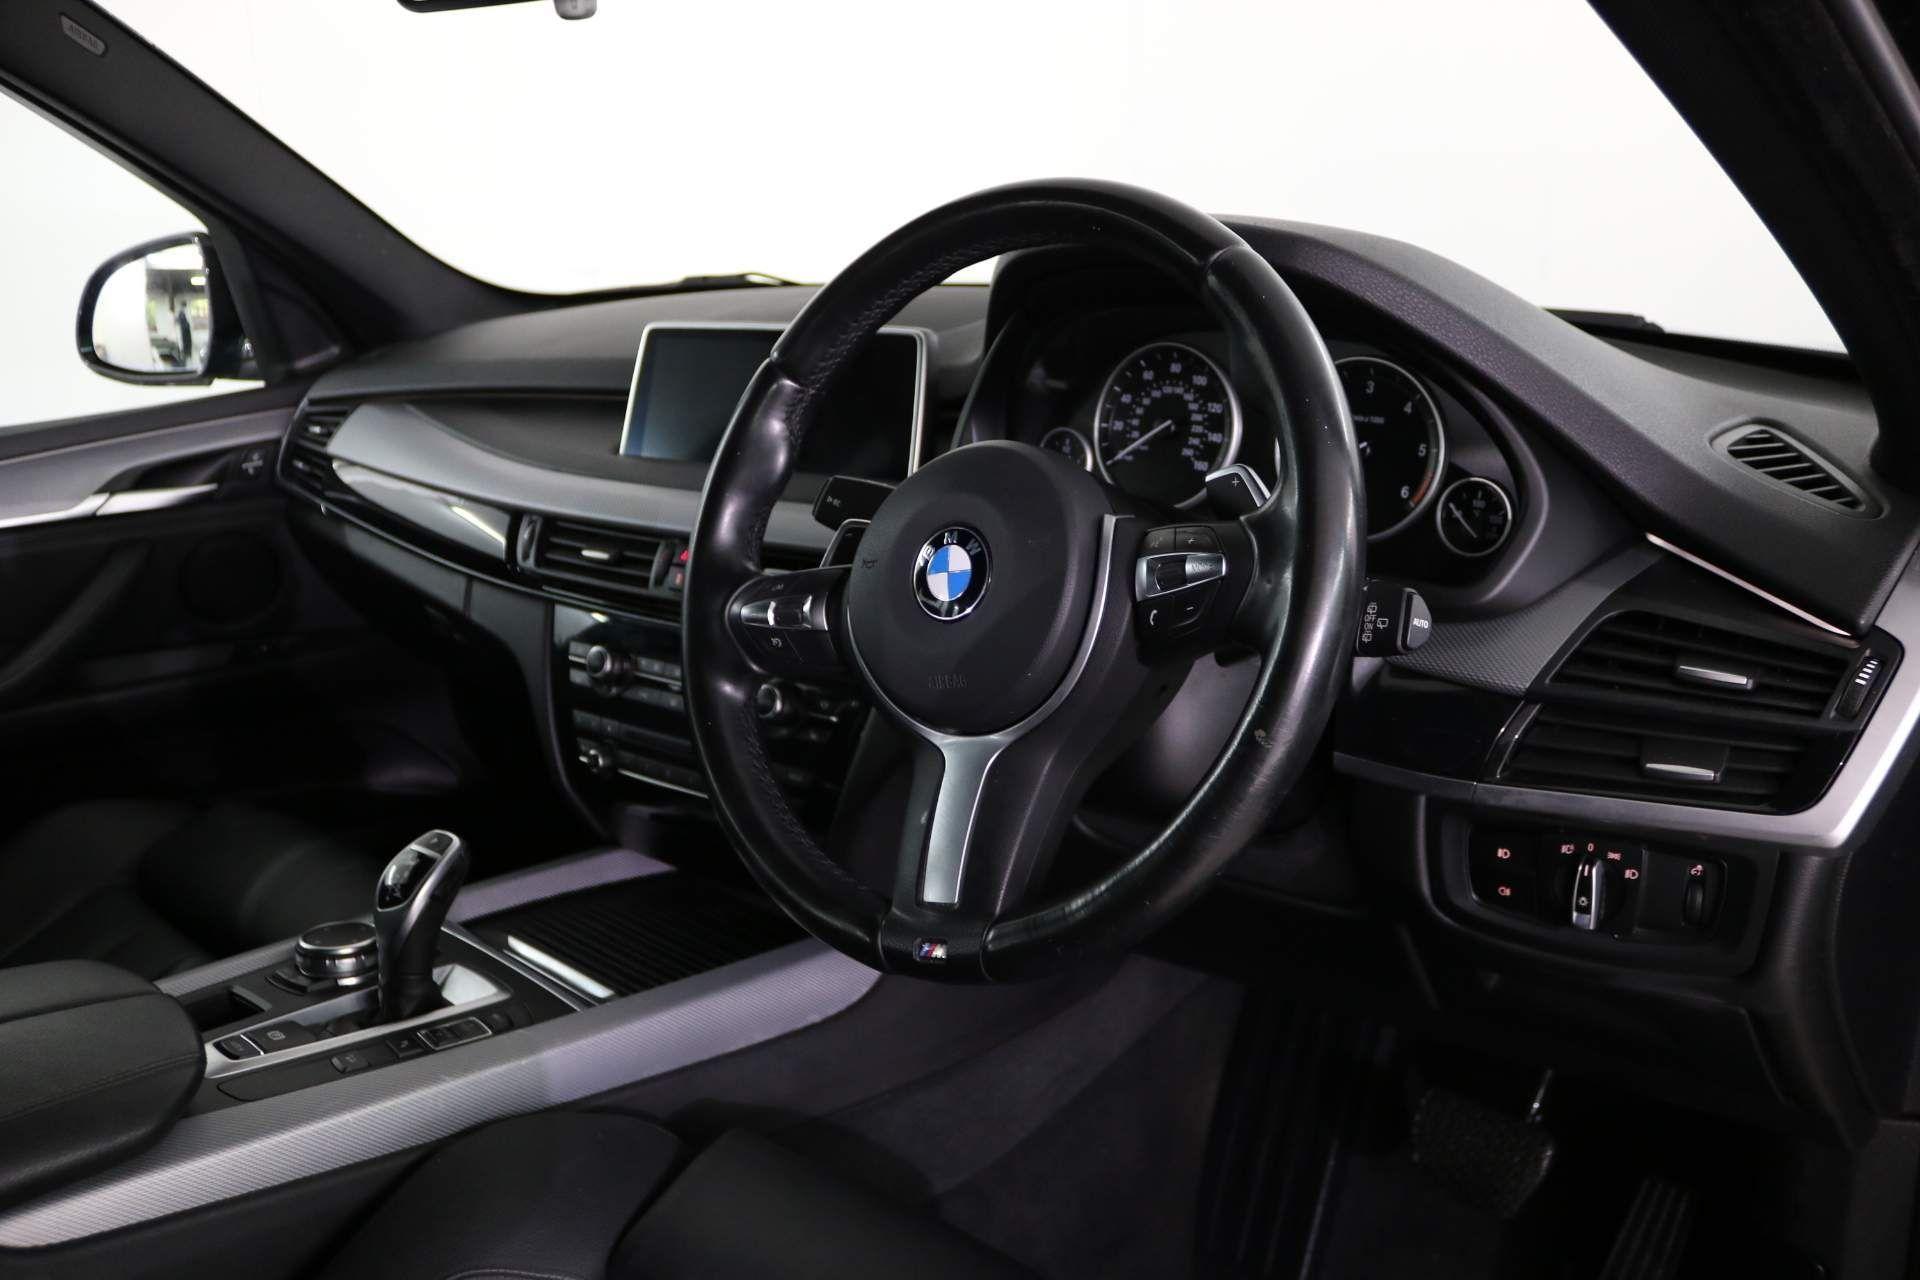 "BMW X5 3.0d xDrive""Auto"" Special Equipment - 15 Reg - 7 Seater -Leather - Sat Nav -Mega Spec- No Vat - Image 7 of 13"